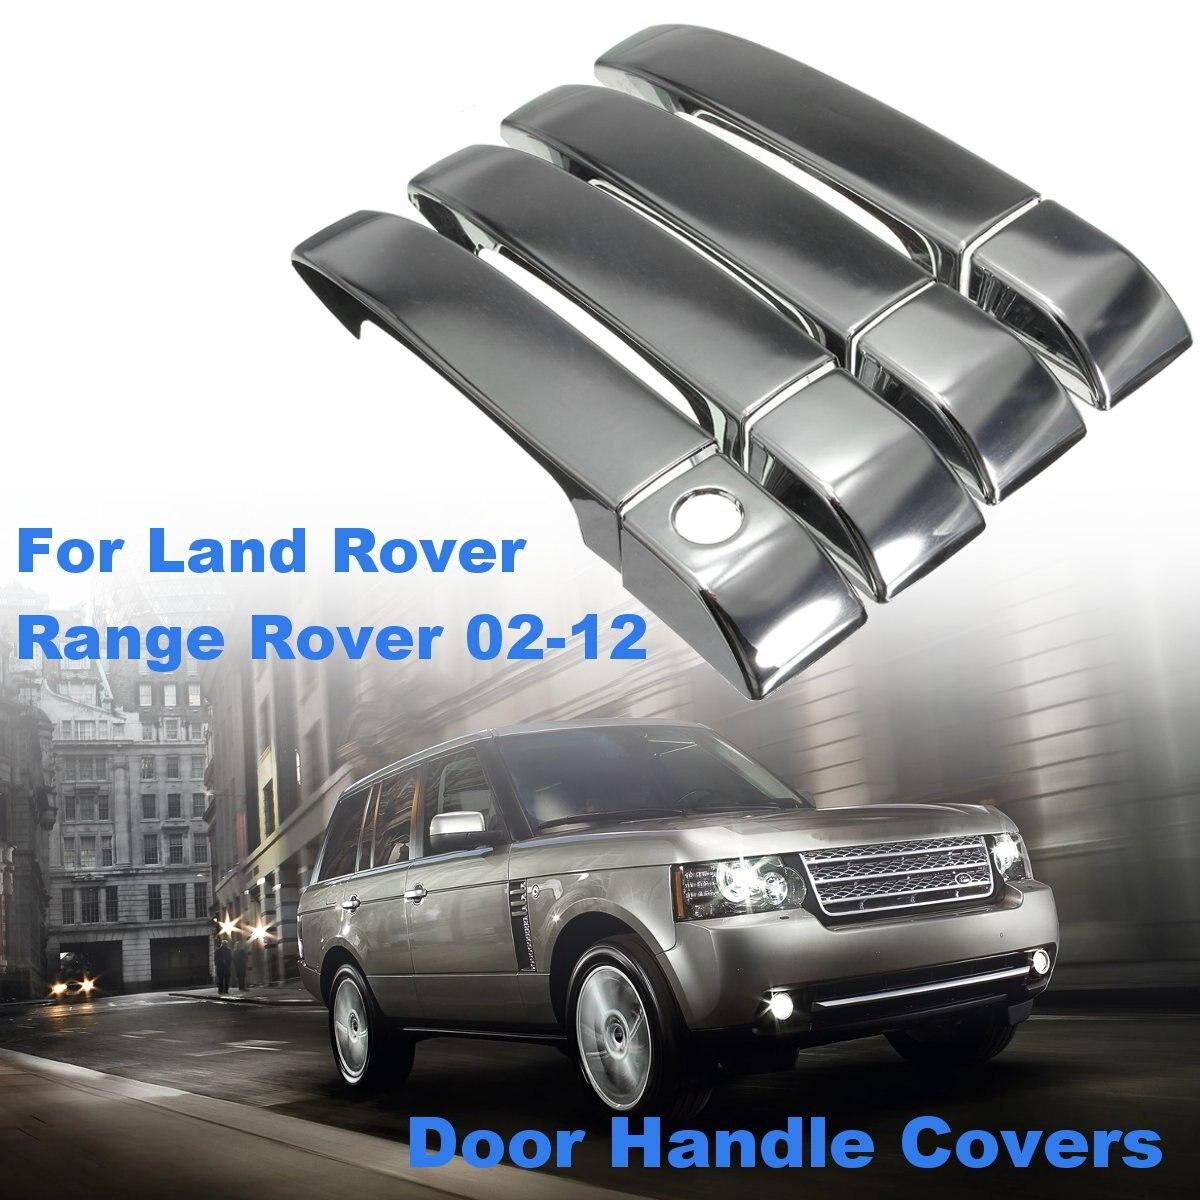 Prata Cromado Door Handle Covers Set para Land Rover Range Rover 2002 2003 2004 2005 2006 2007 2008 2009 2010 2011 2012